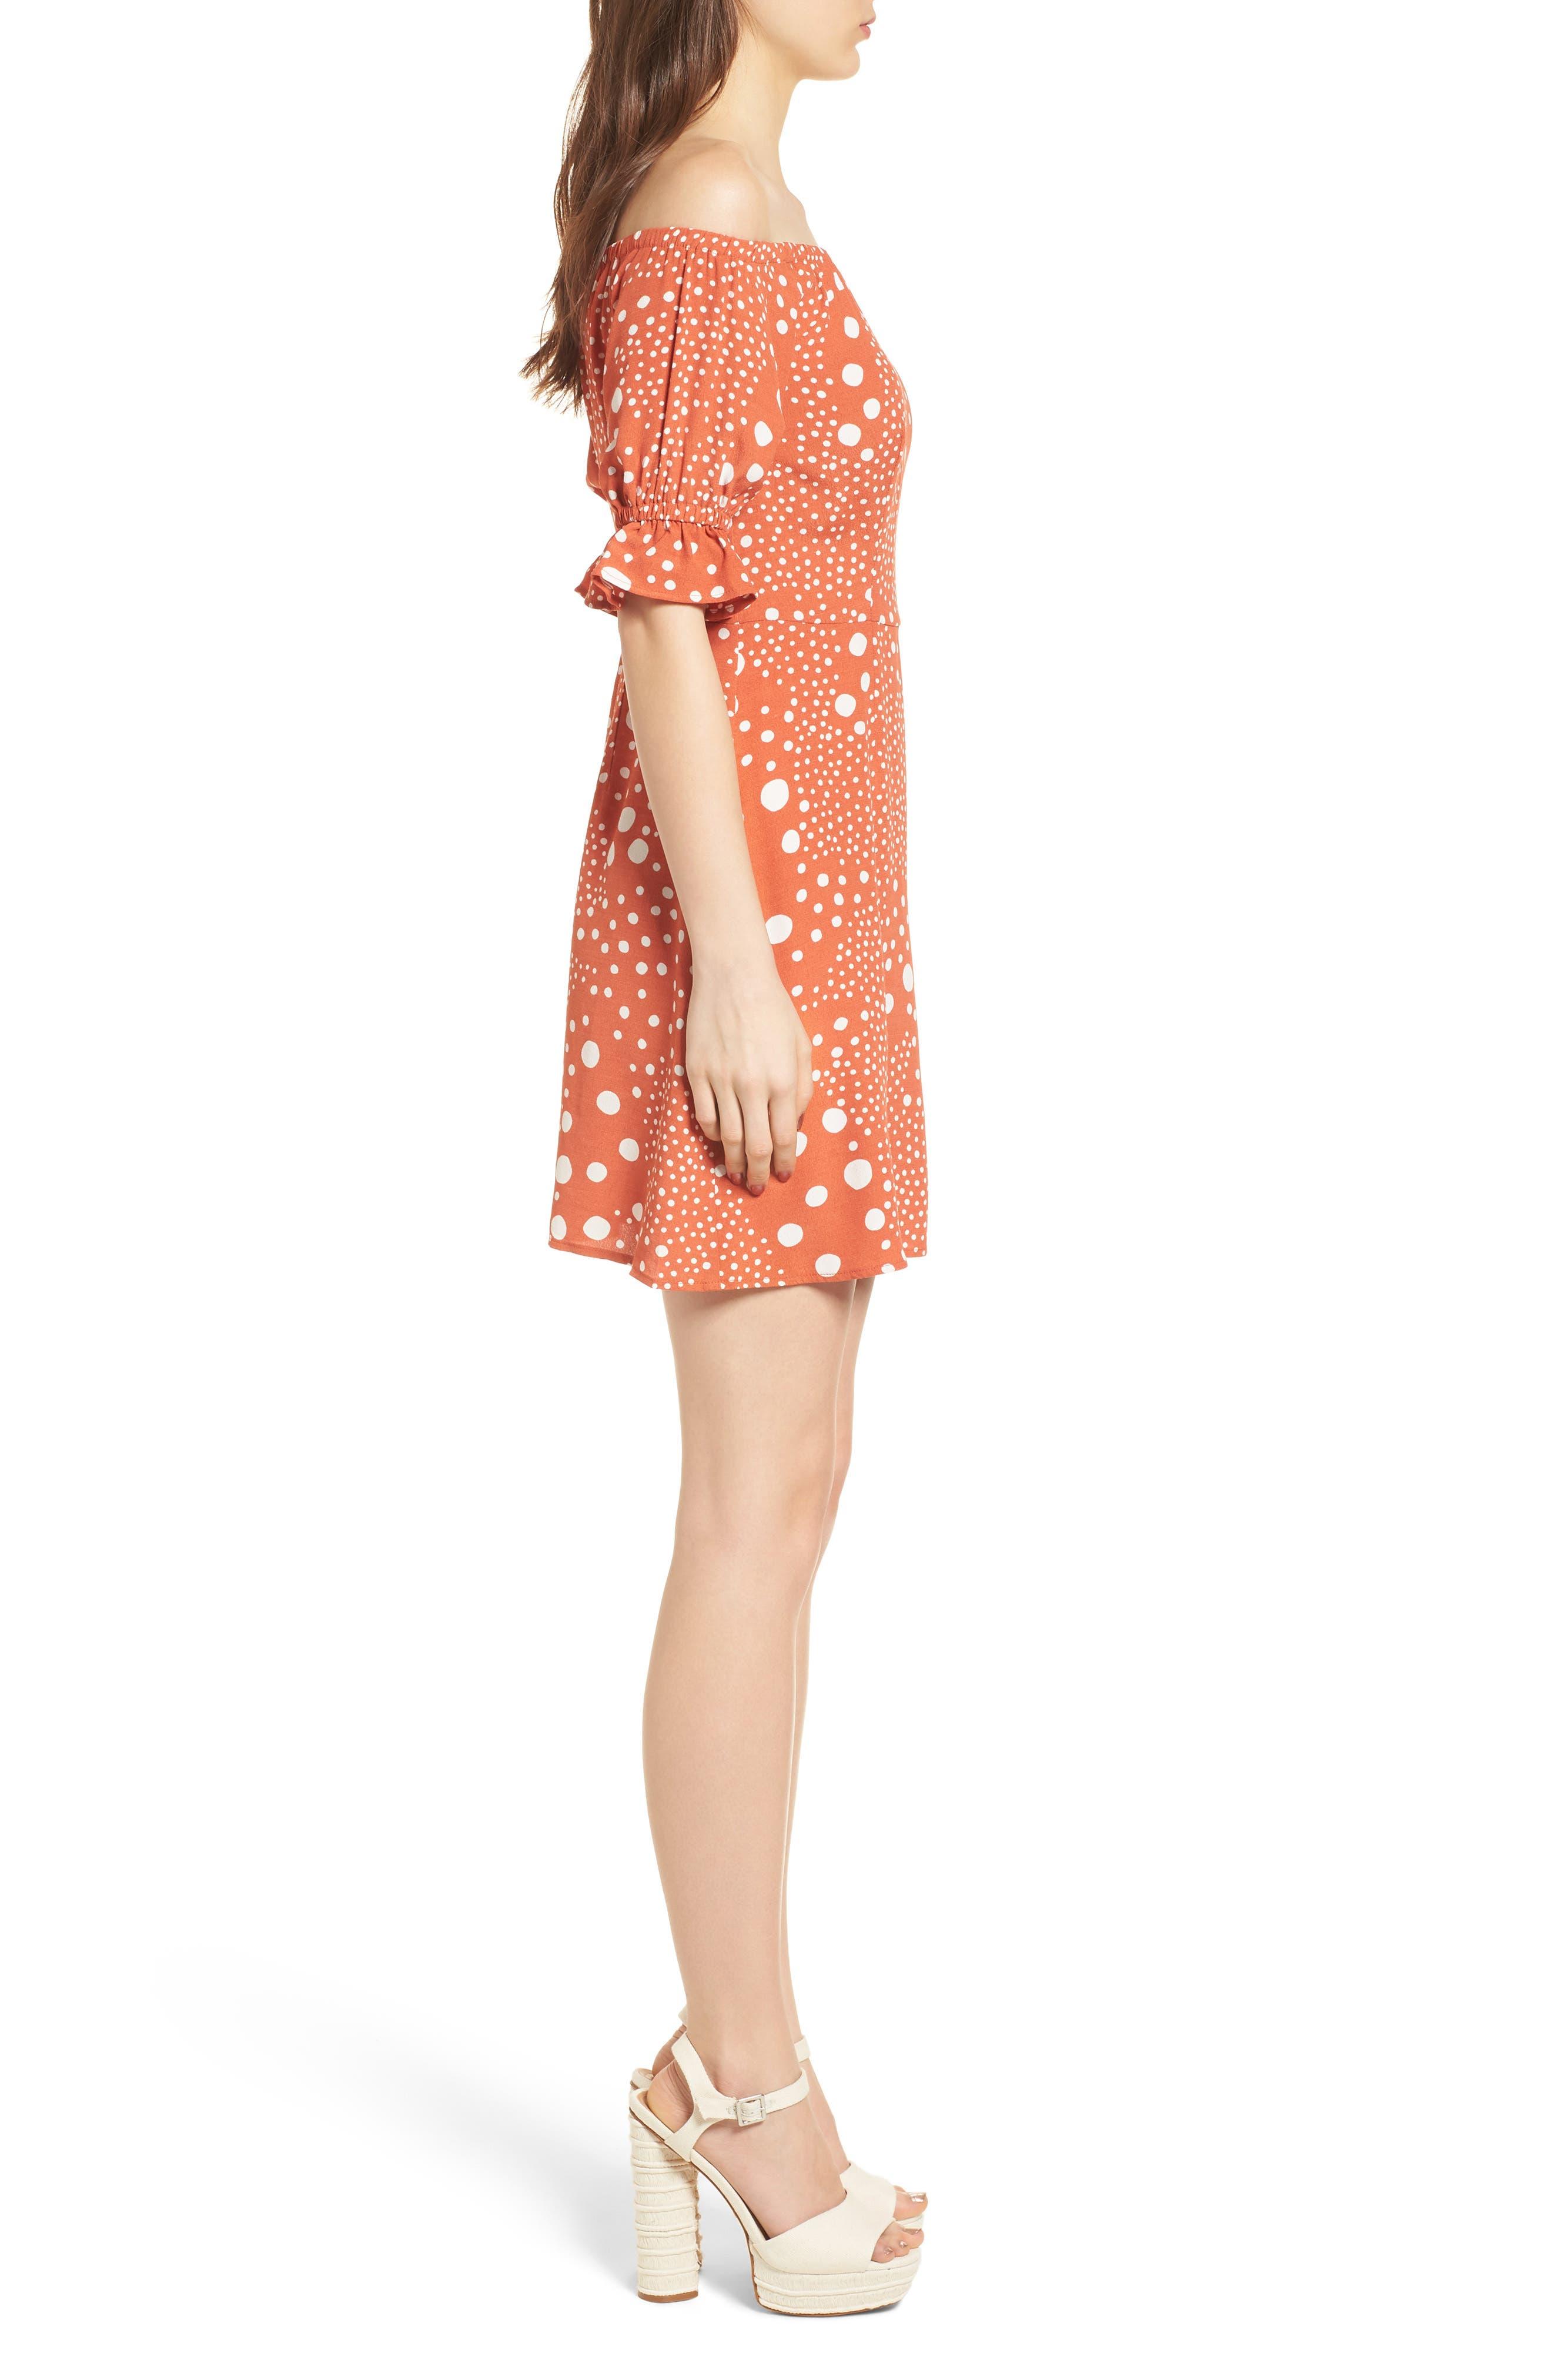 Peppers Polka Dot Off the Shoulder Dress,                             Alternate thumbnail 4, color,                             Rust Pebble